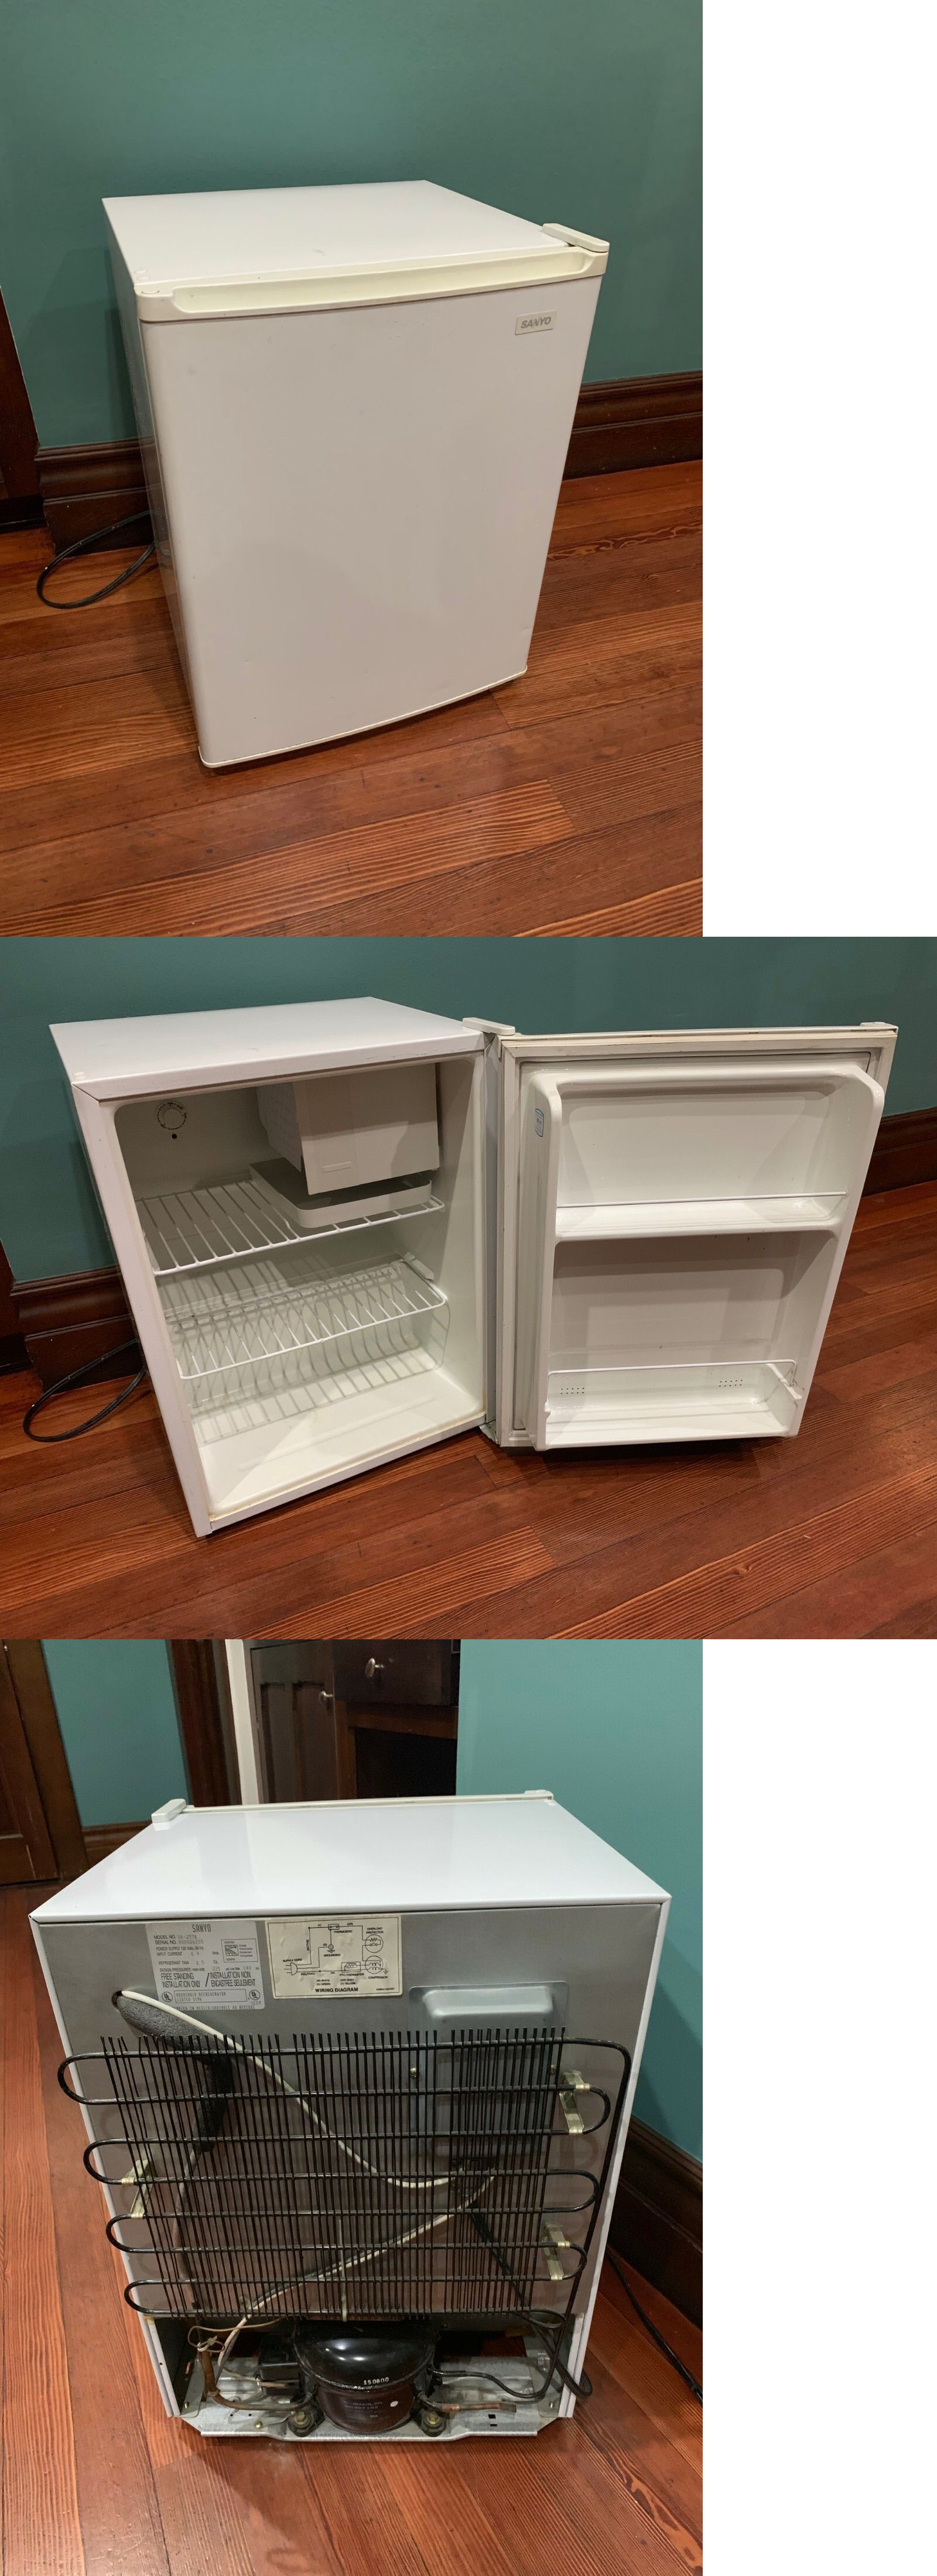 medium resolution of mini fridges 71262 brand new sanyo sr 257w mini fridge buy it now only 45 on ebay fridges brand sanyo fridge